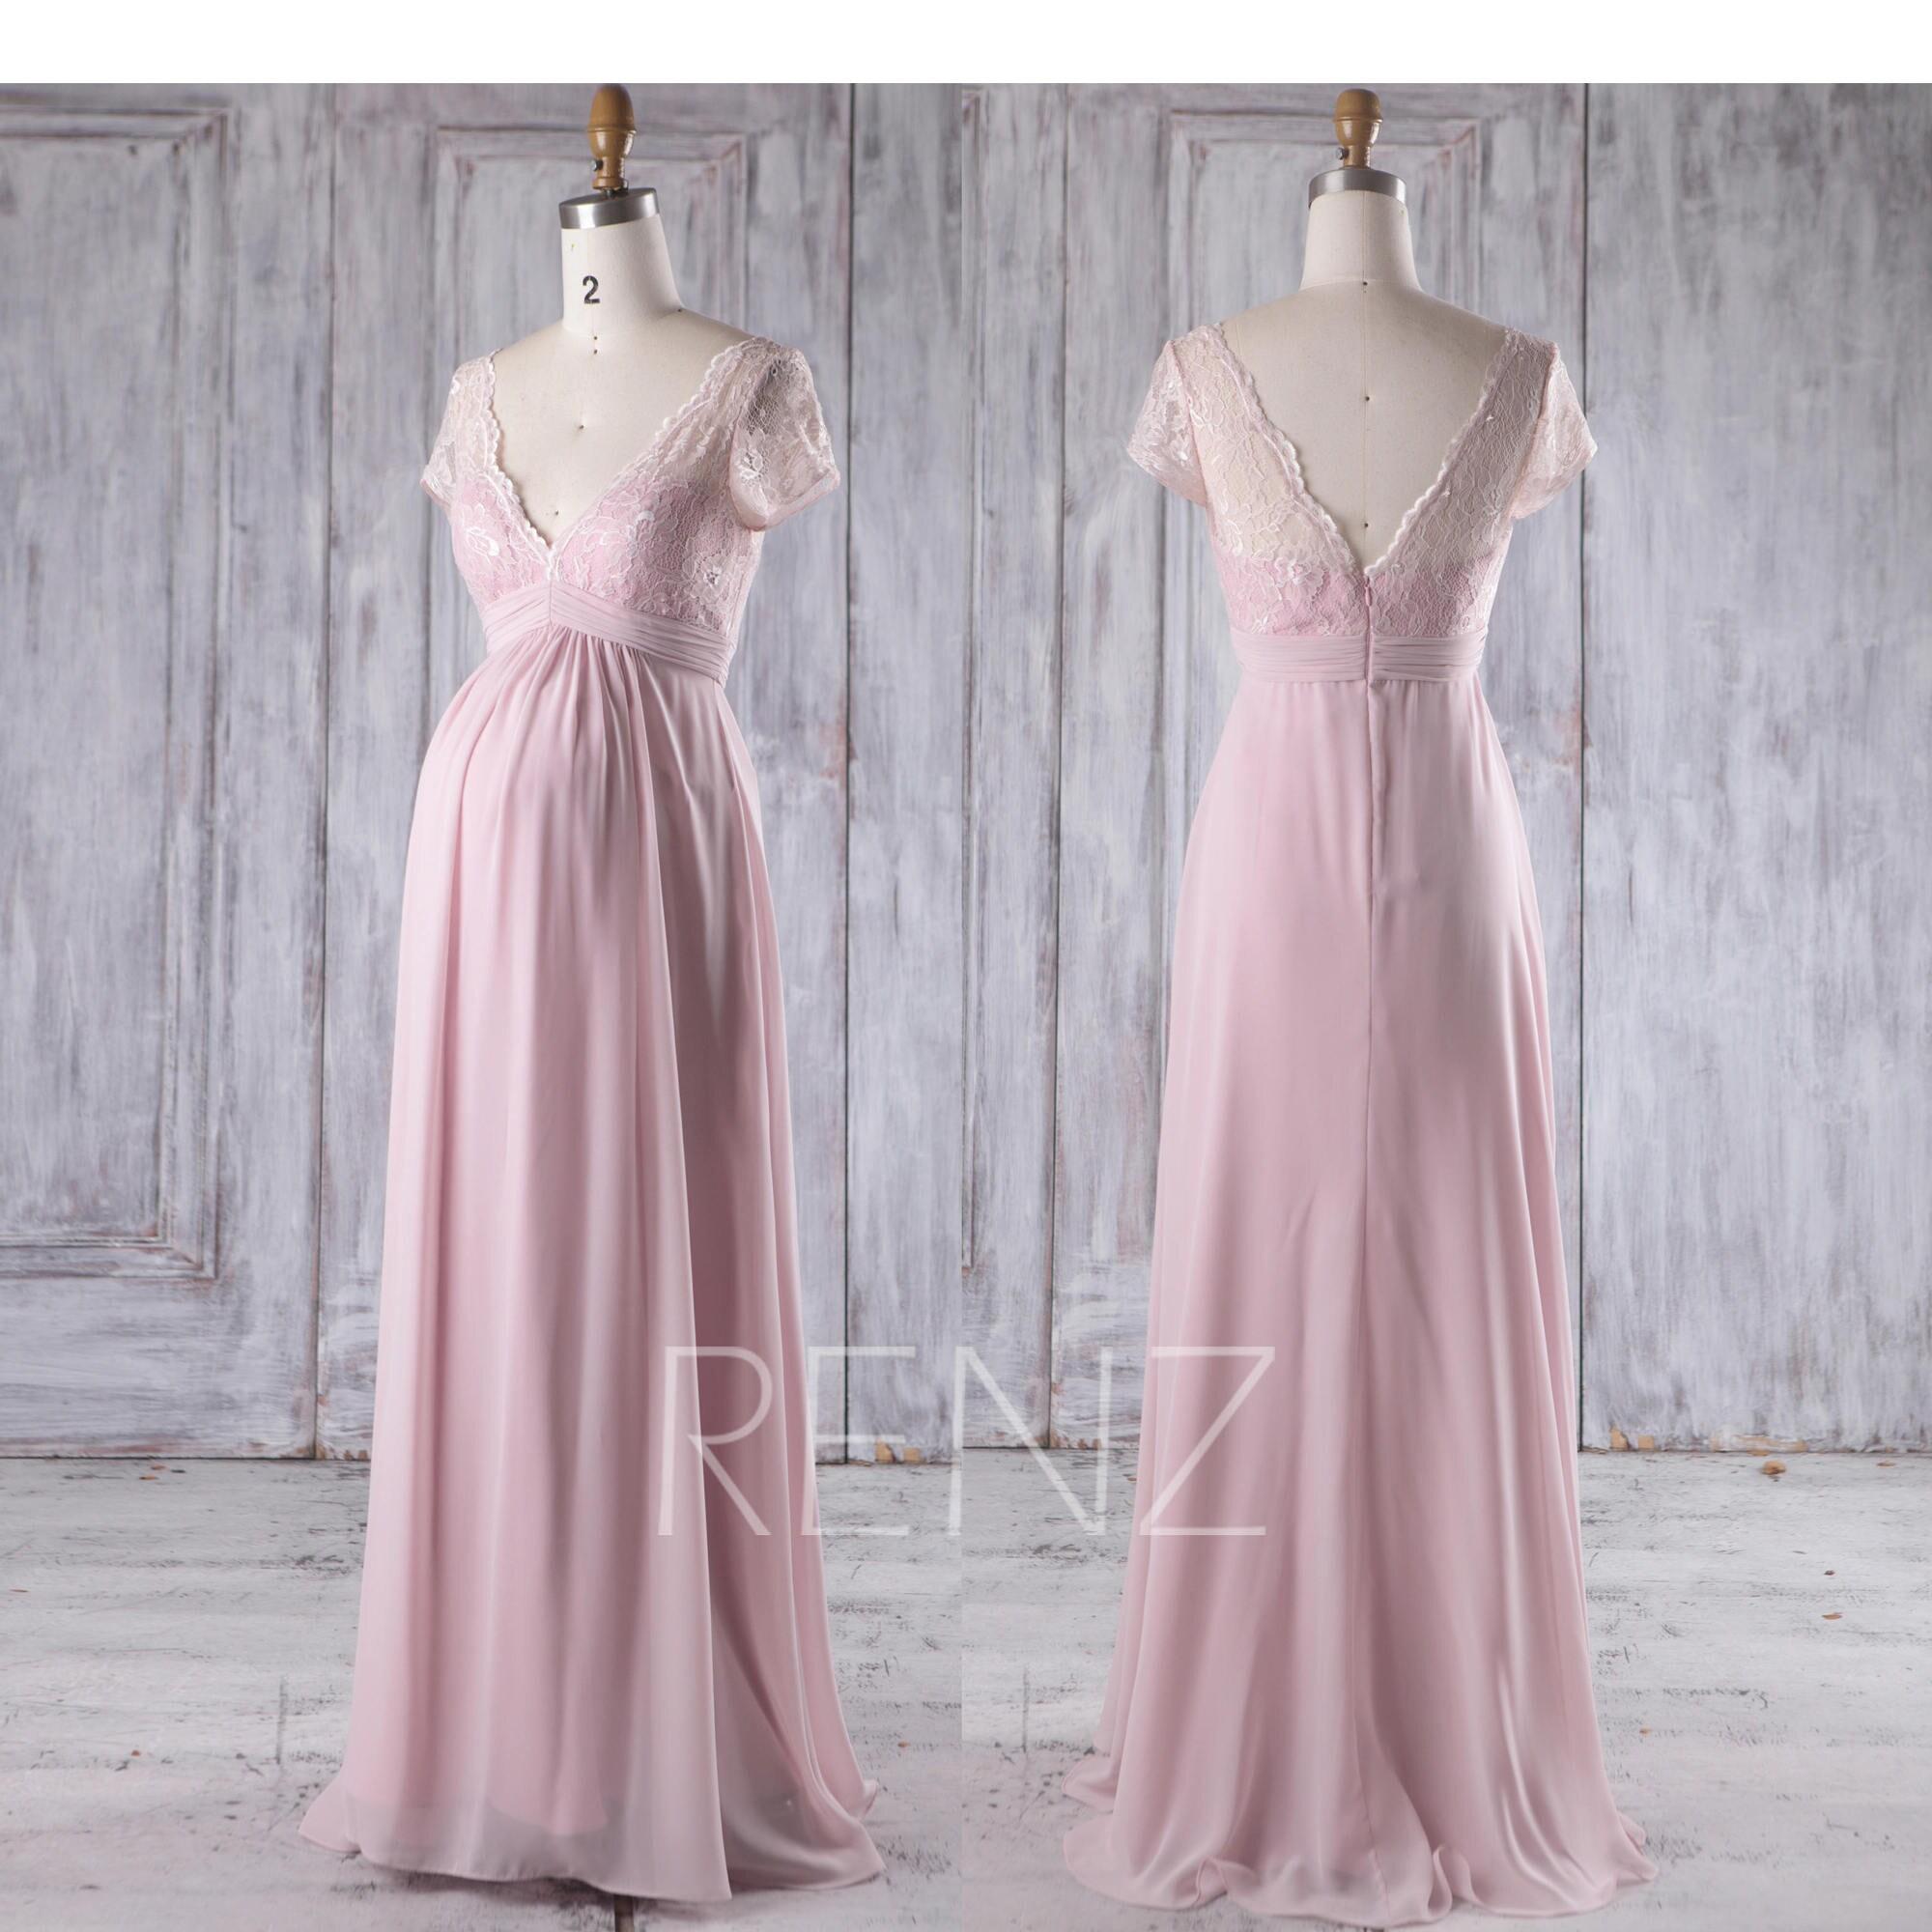 Blush chiffon maternity bridesmaid dress lace v neck wedding zoom ombrellifo Image collections